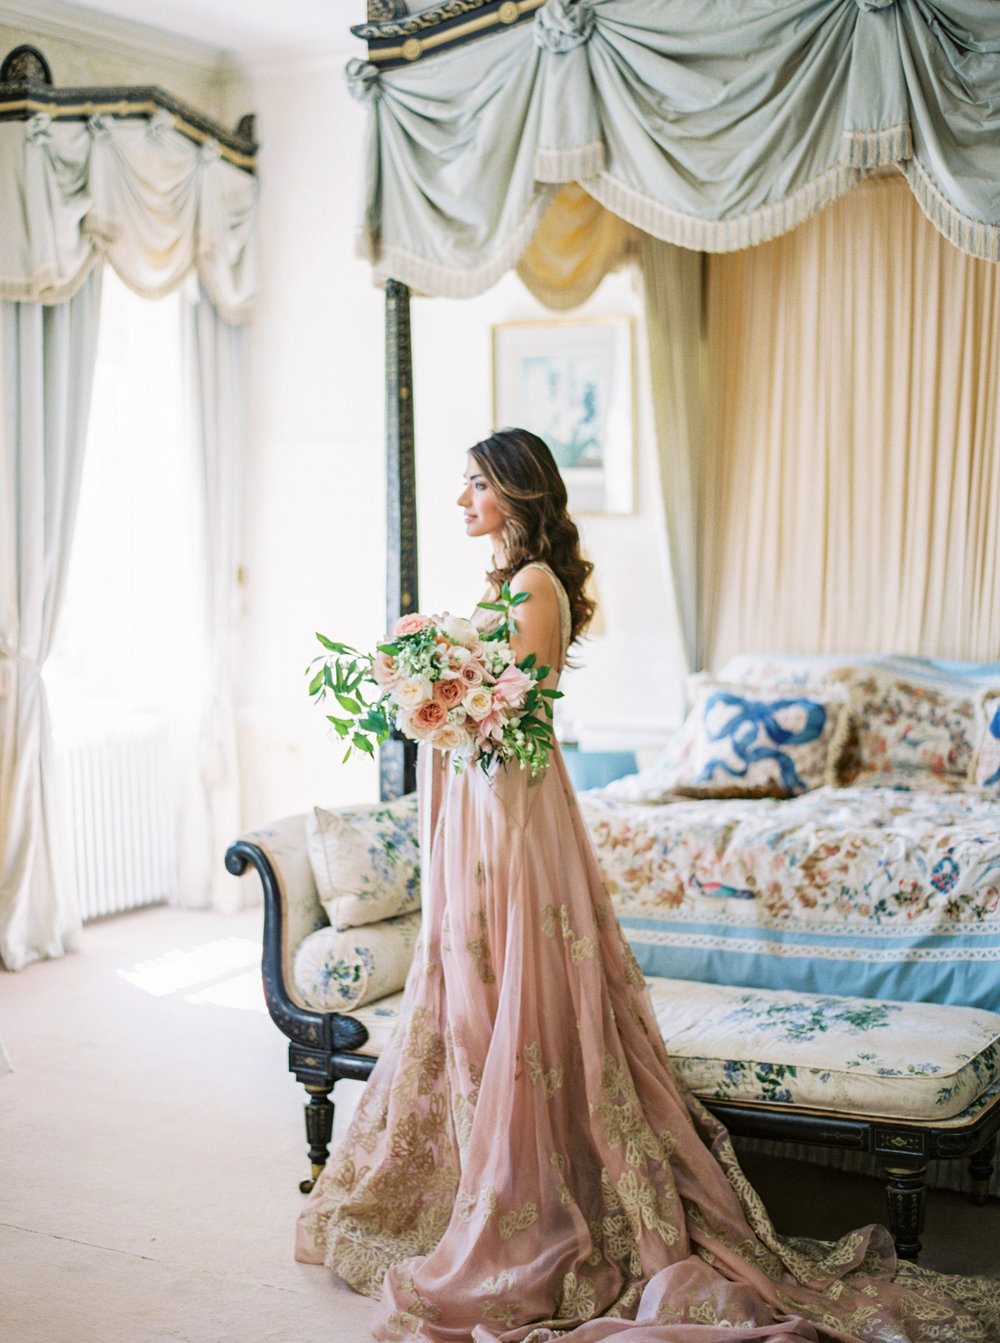 MelissaBlytheFineArtPhotography-CornwellManor_-8.jpg